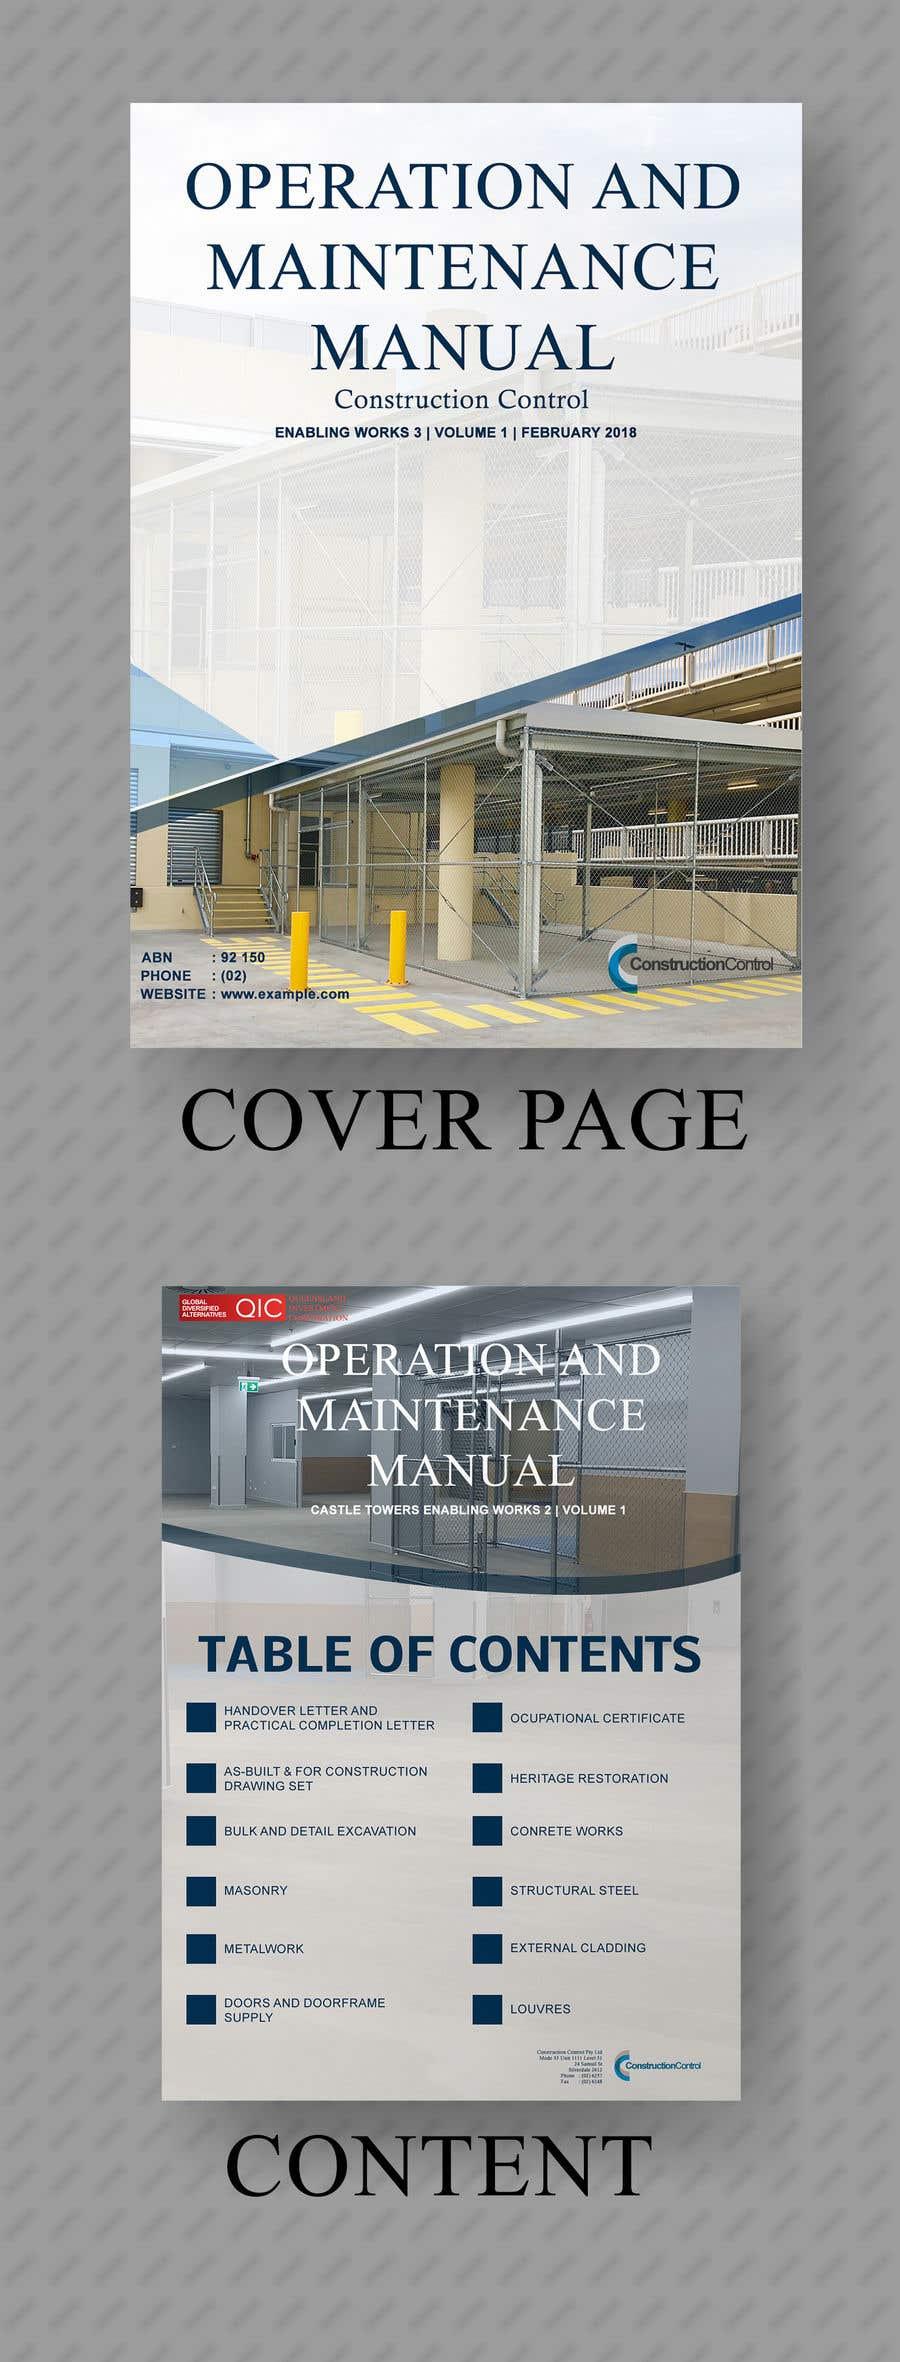 Bài tham dự cuộc thi #18 cho Cover Page & Contents Page Design